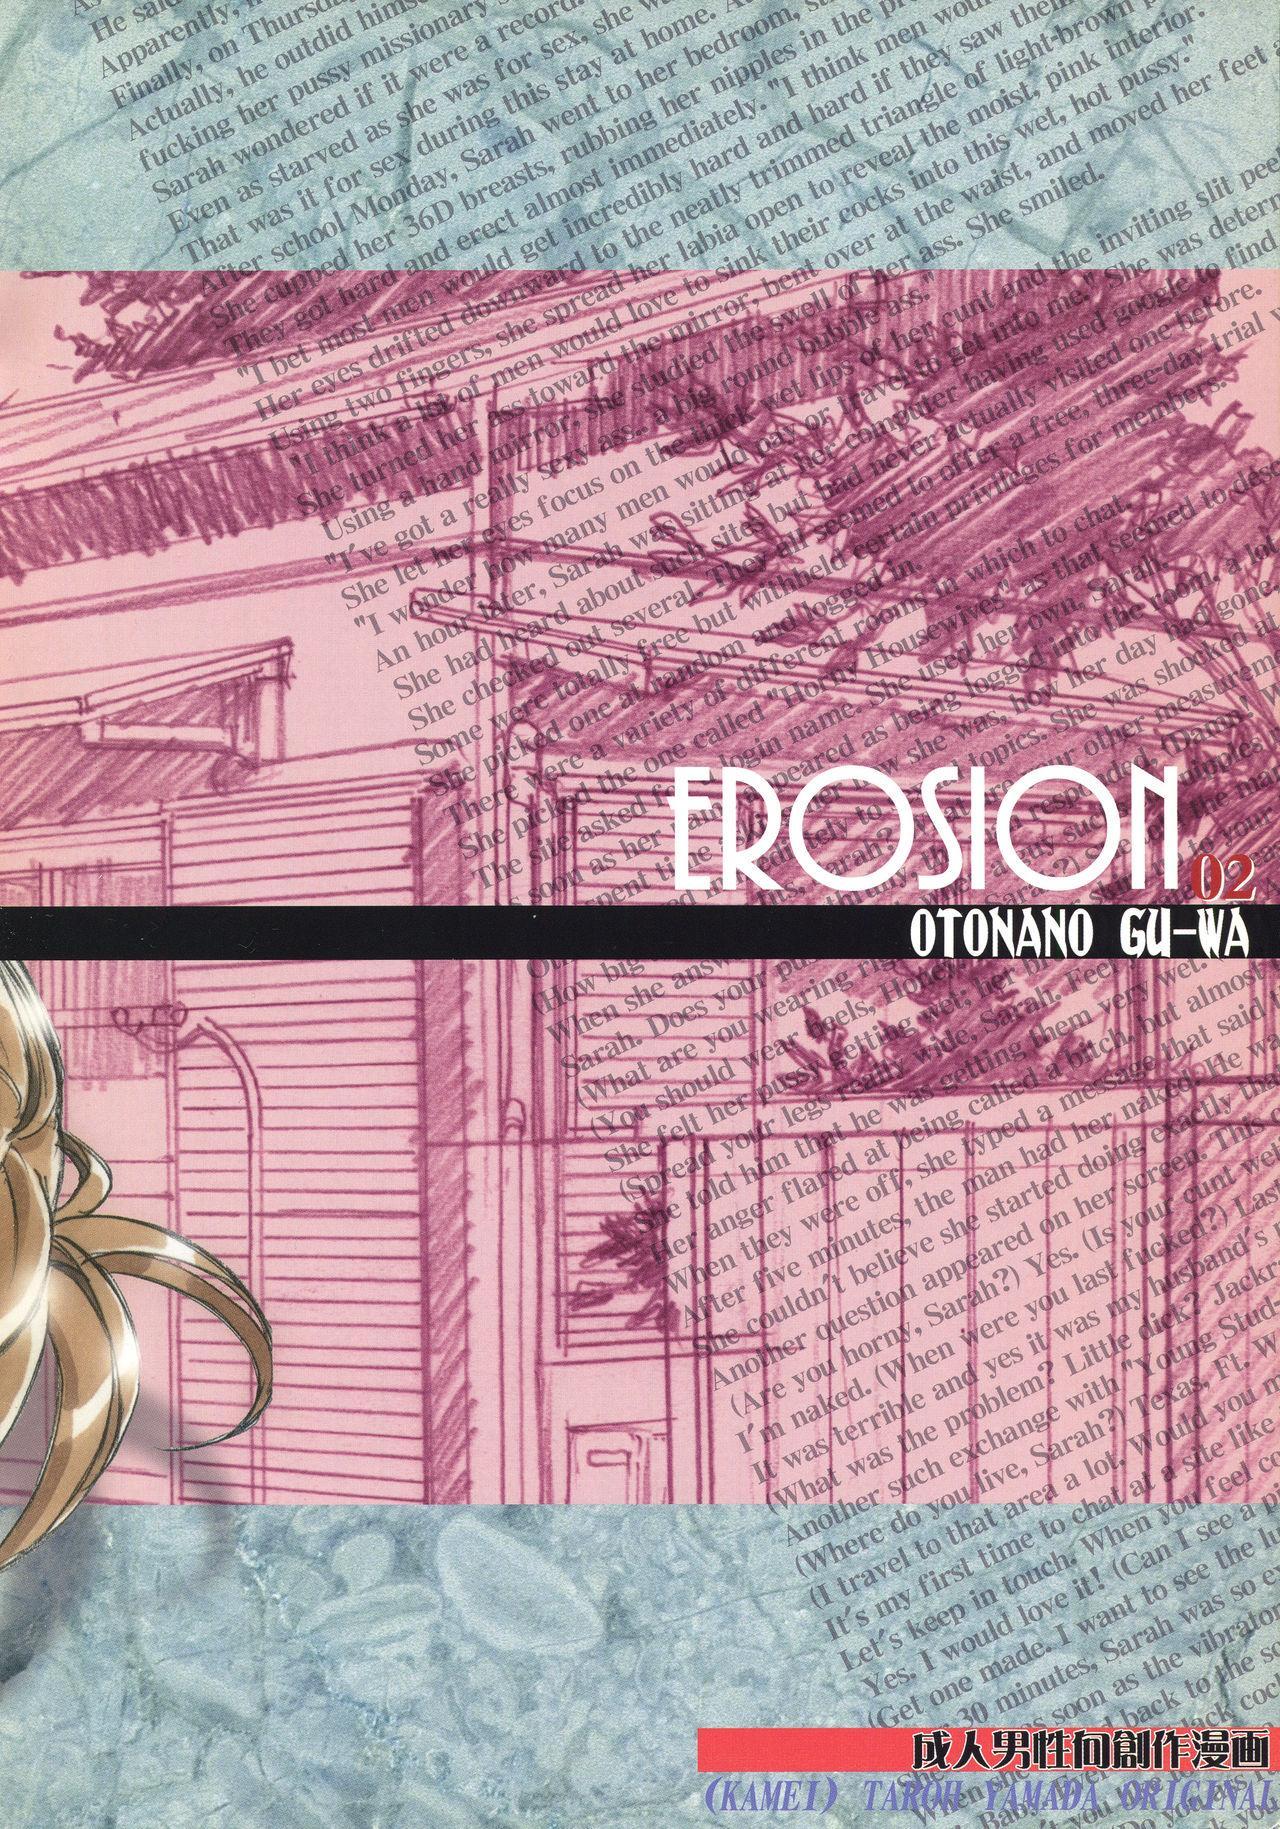 EROSION 02 29